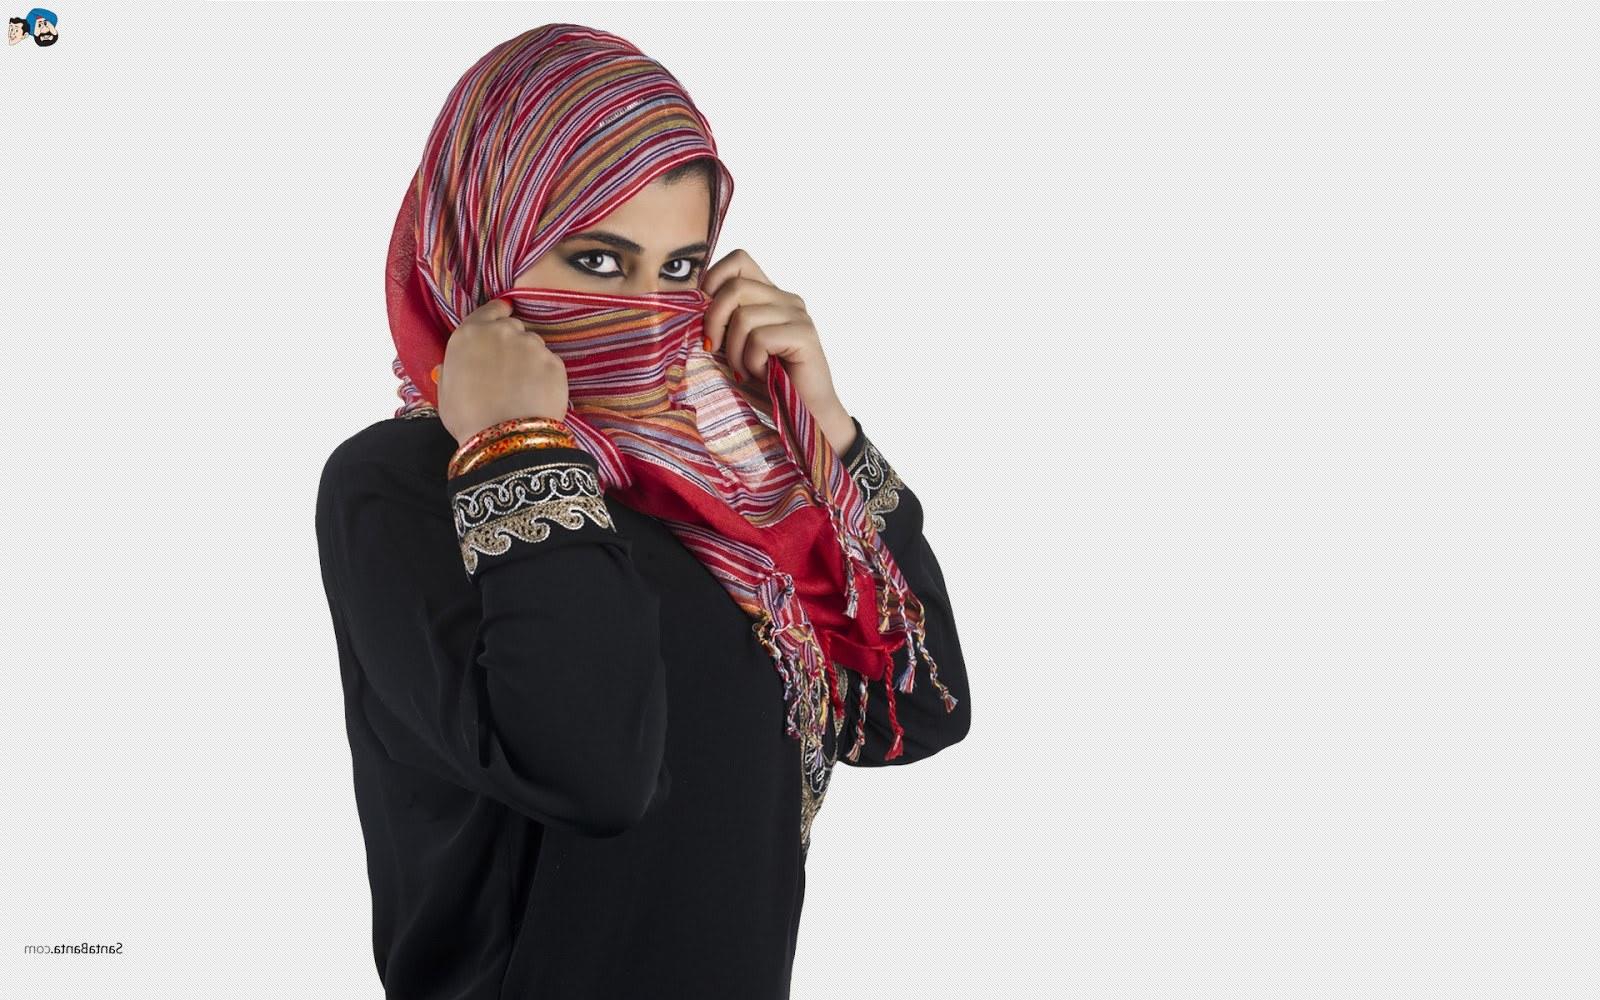 Bentuk Muslimah Bercadar Hitam Y7du Koleksi Wallpaper Wanita Muslimah Bercadar